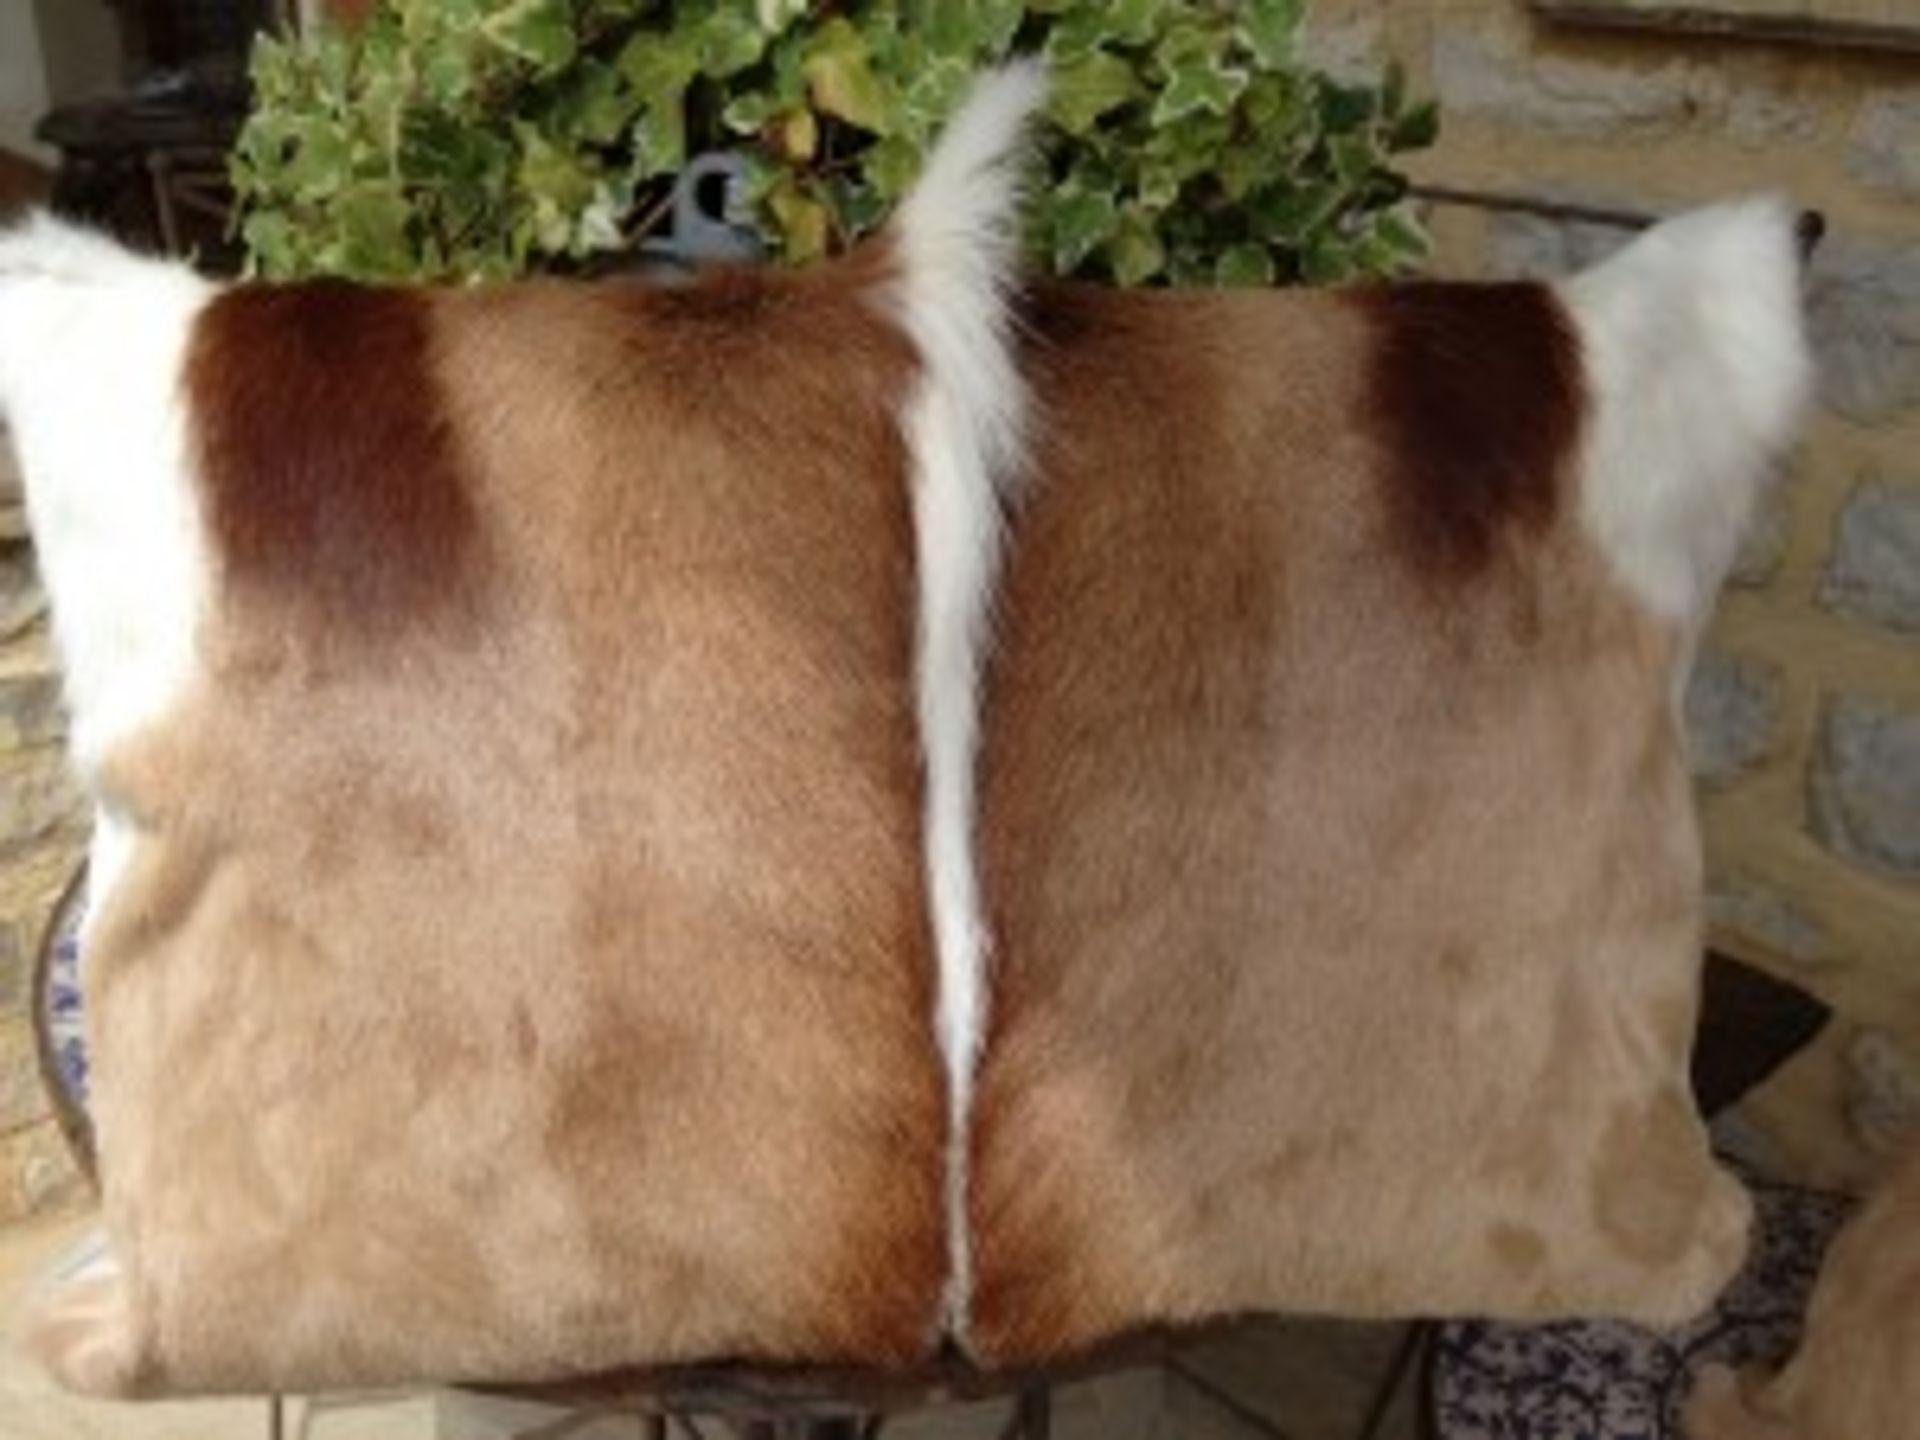 Lot 33 - Springbok Cushions A Beautiful Set Of 4 x Genuine African Handcrafted Springbok Hide Cushion